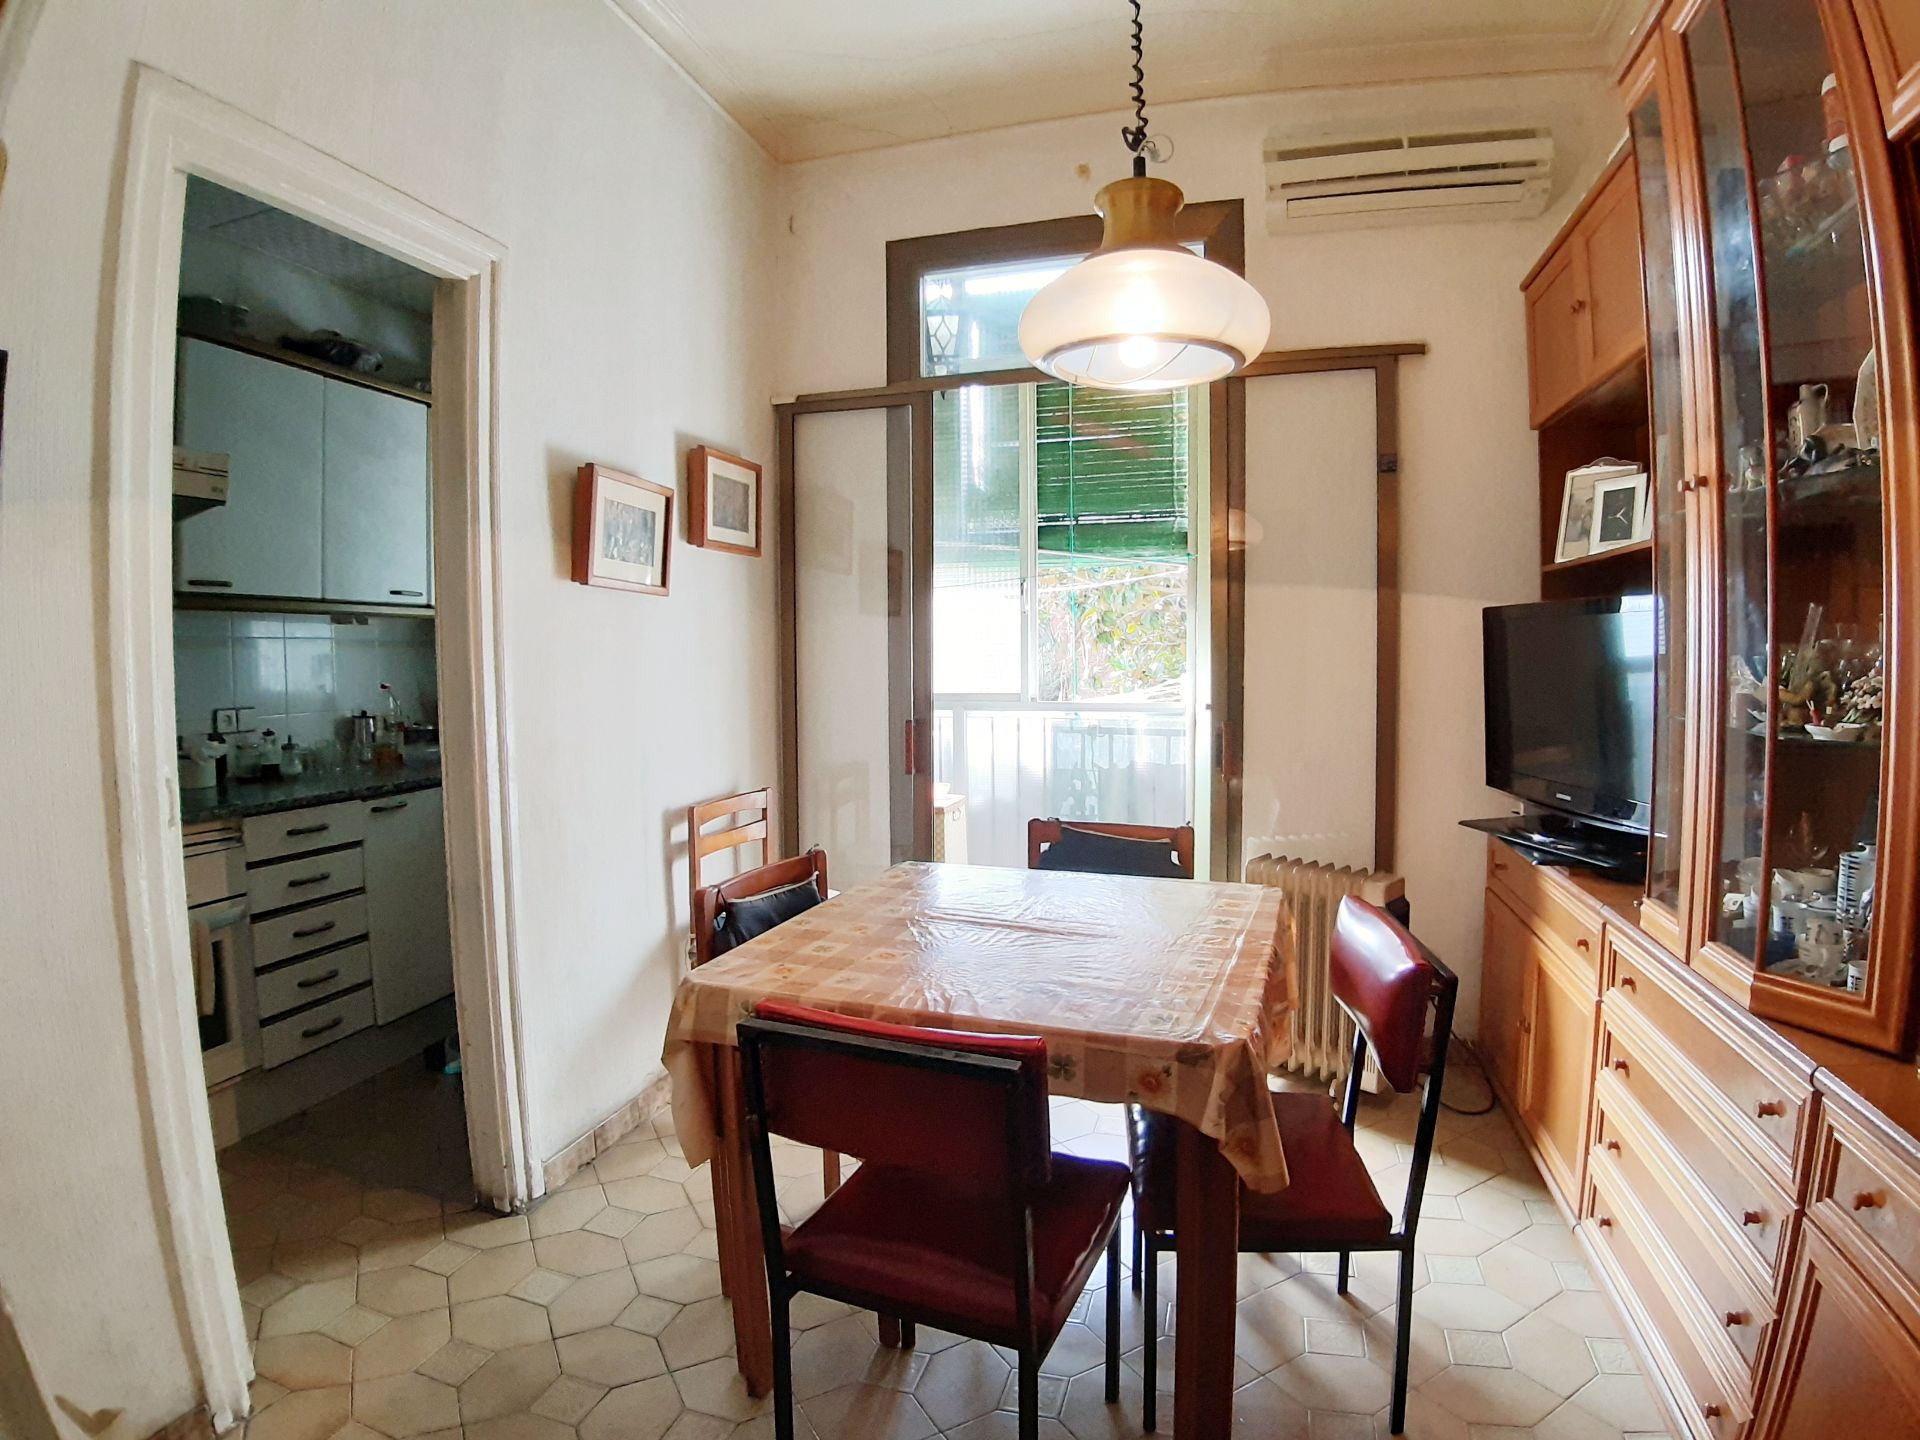 Flat in Barcelona, Gracia, for sale